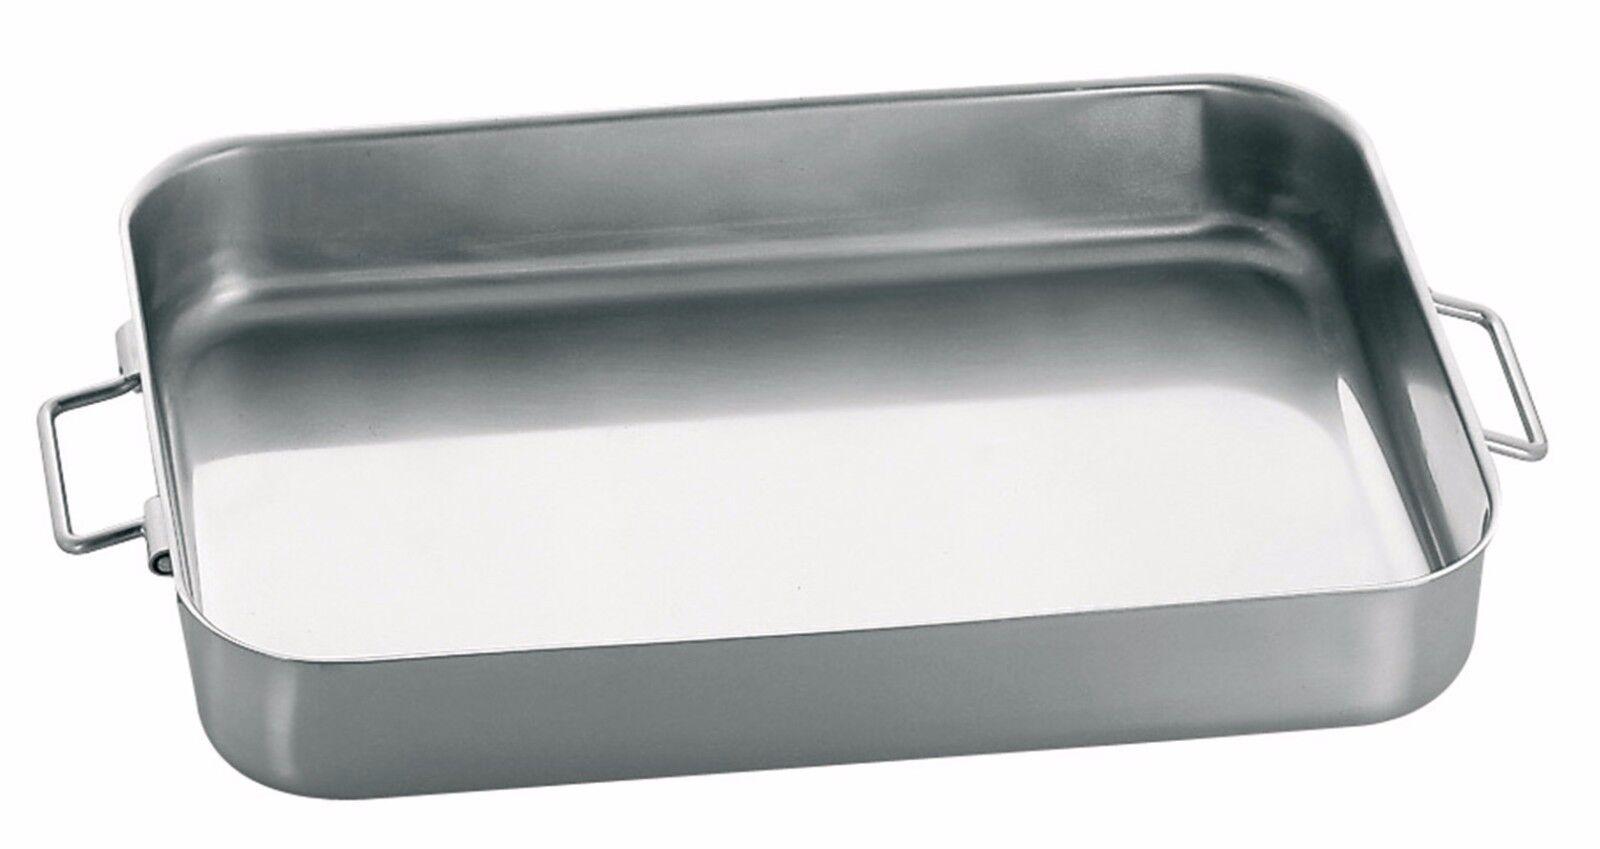 Piazza Effepi Teglia acciaio inox 3 misure